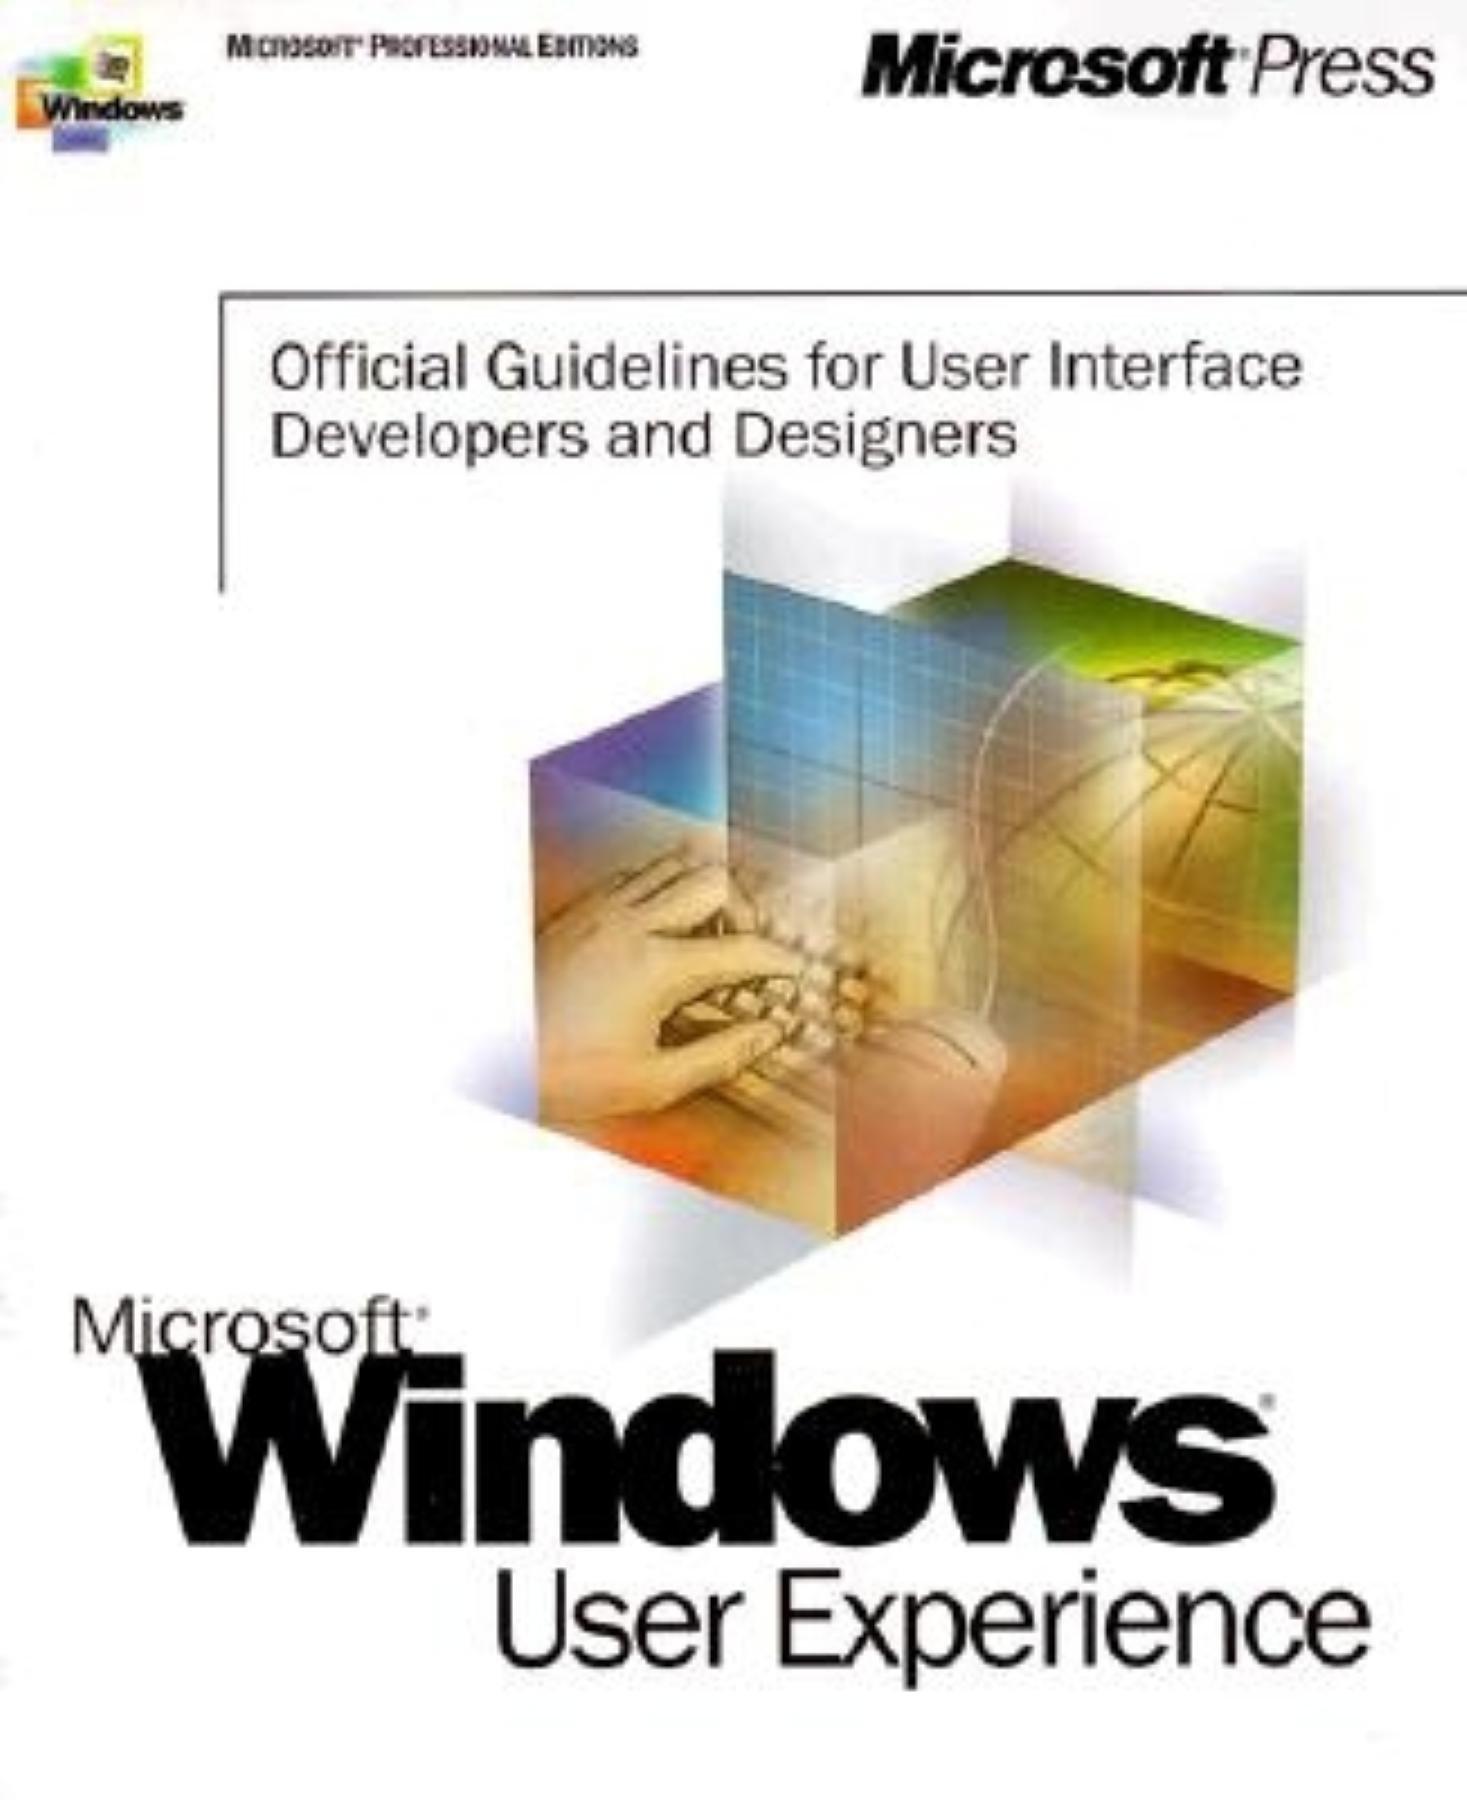 Microsoft Windows User Experience Microsoft Professional Editions Microsoft Corporation Microsoft Corporation Staff Windows User Experience Team 9780735605664 Amazon Com Books